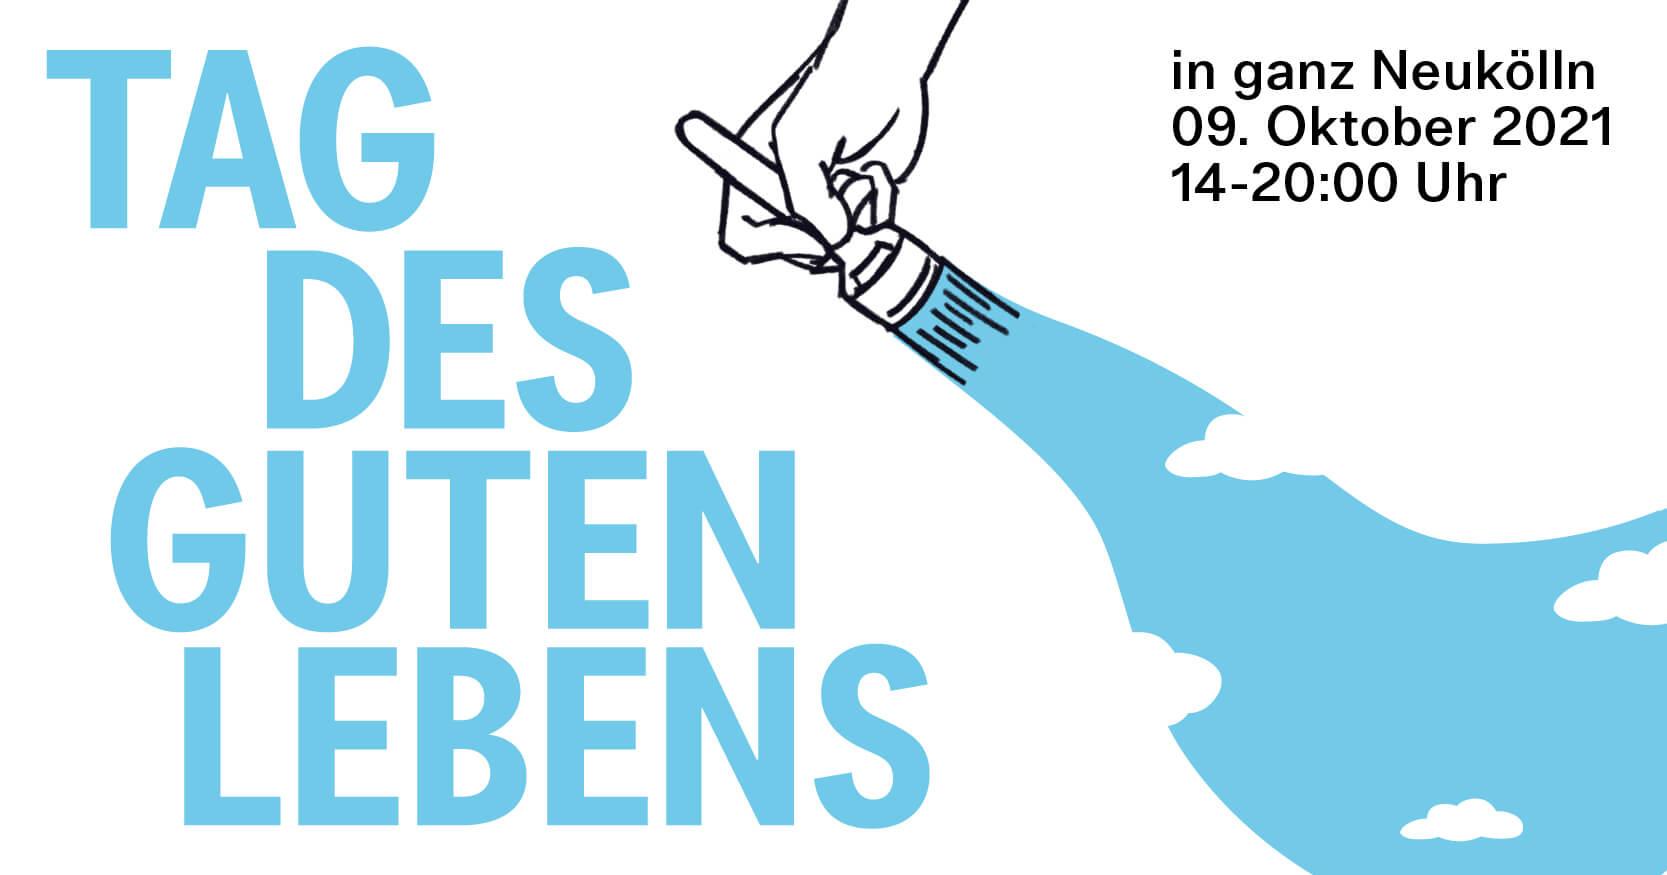 Tag des guten Lebens Neukölln 9. Okotber 2021 - day of the good life